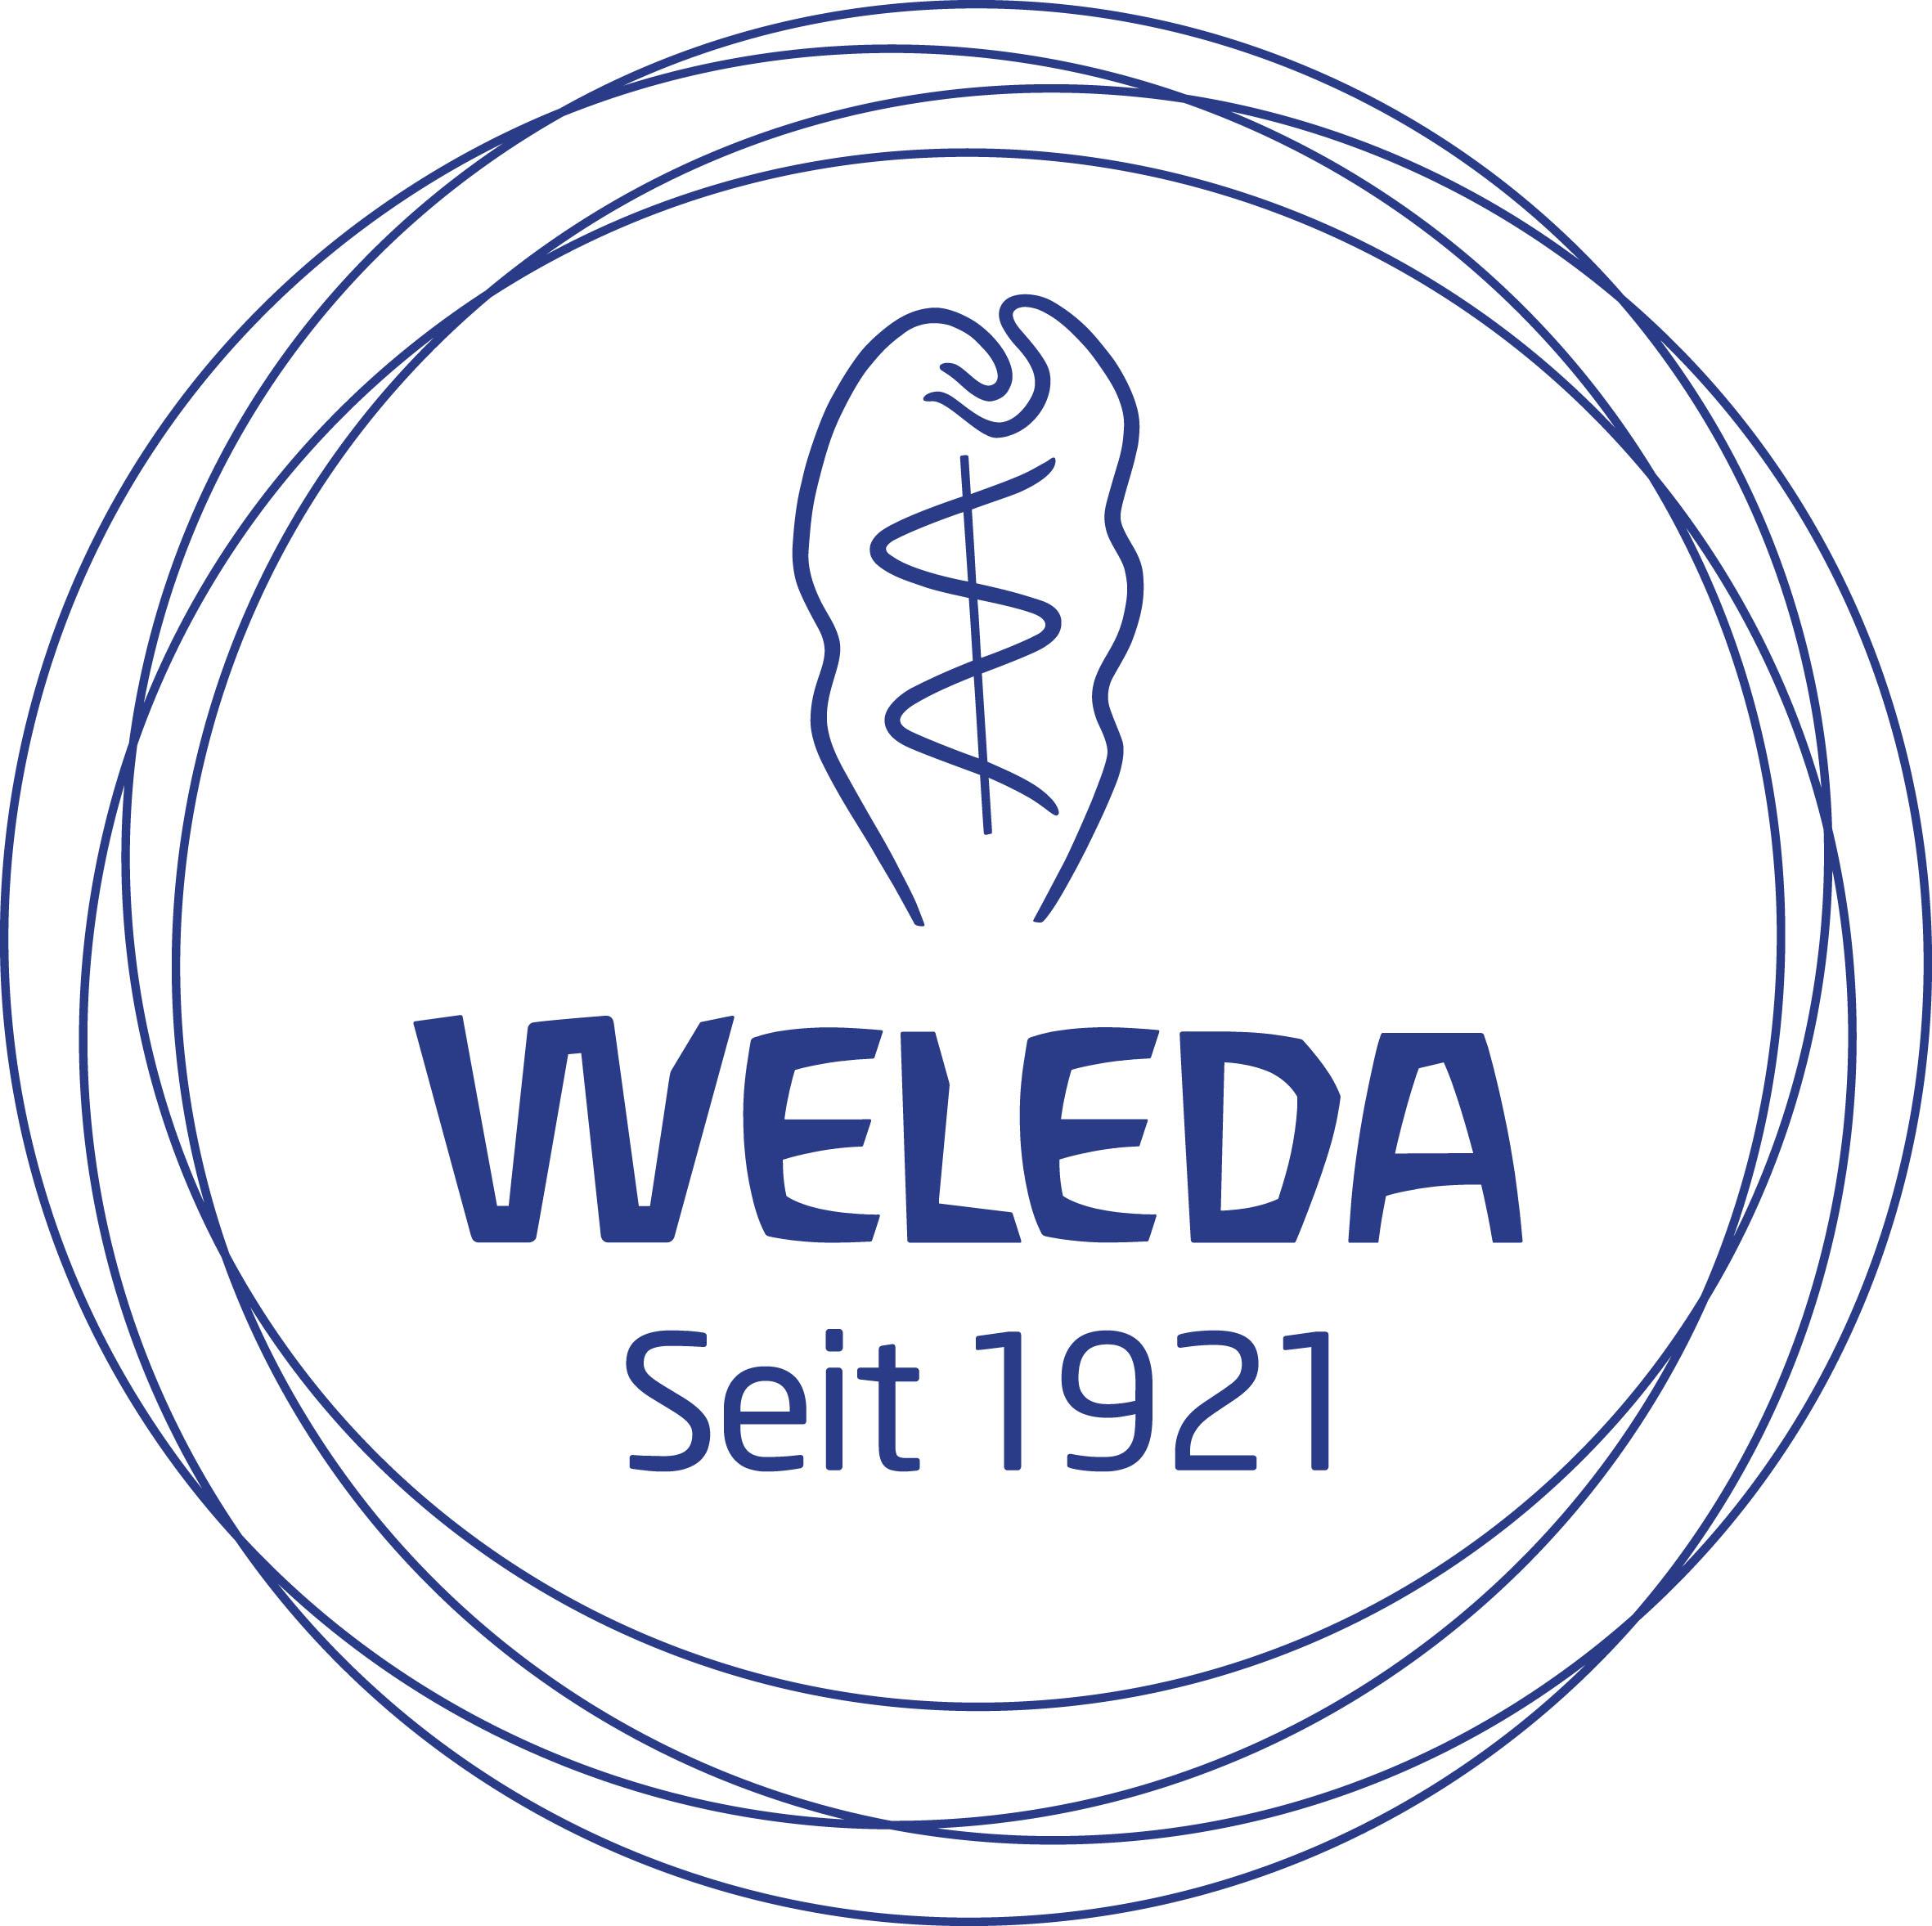 Weleda AG